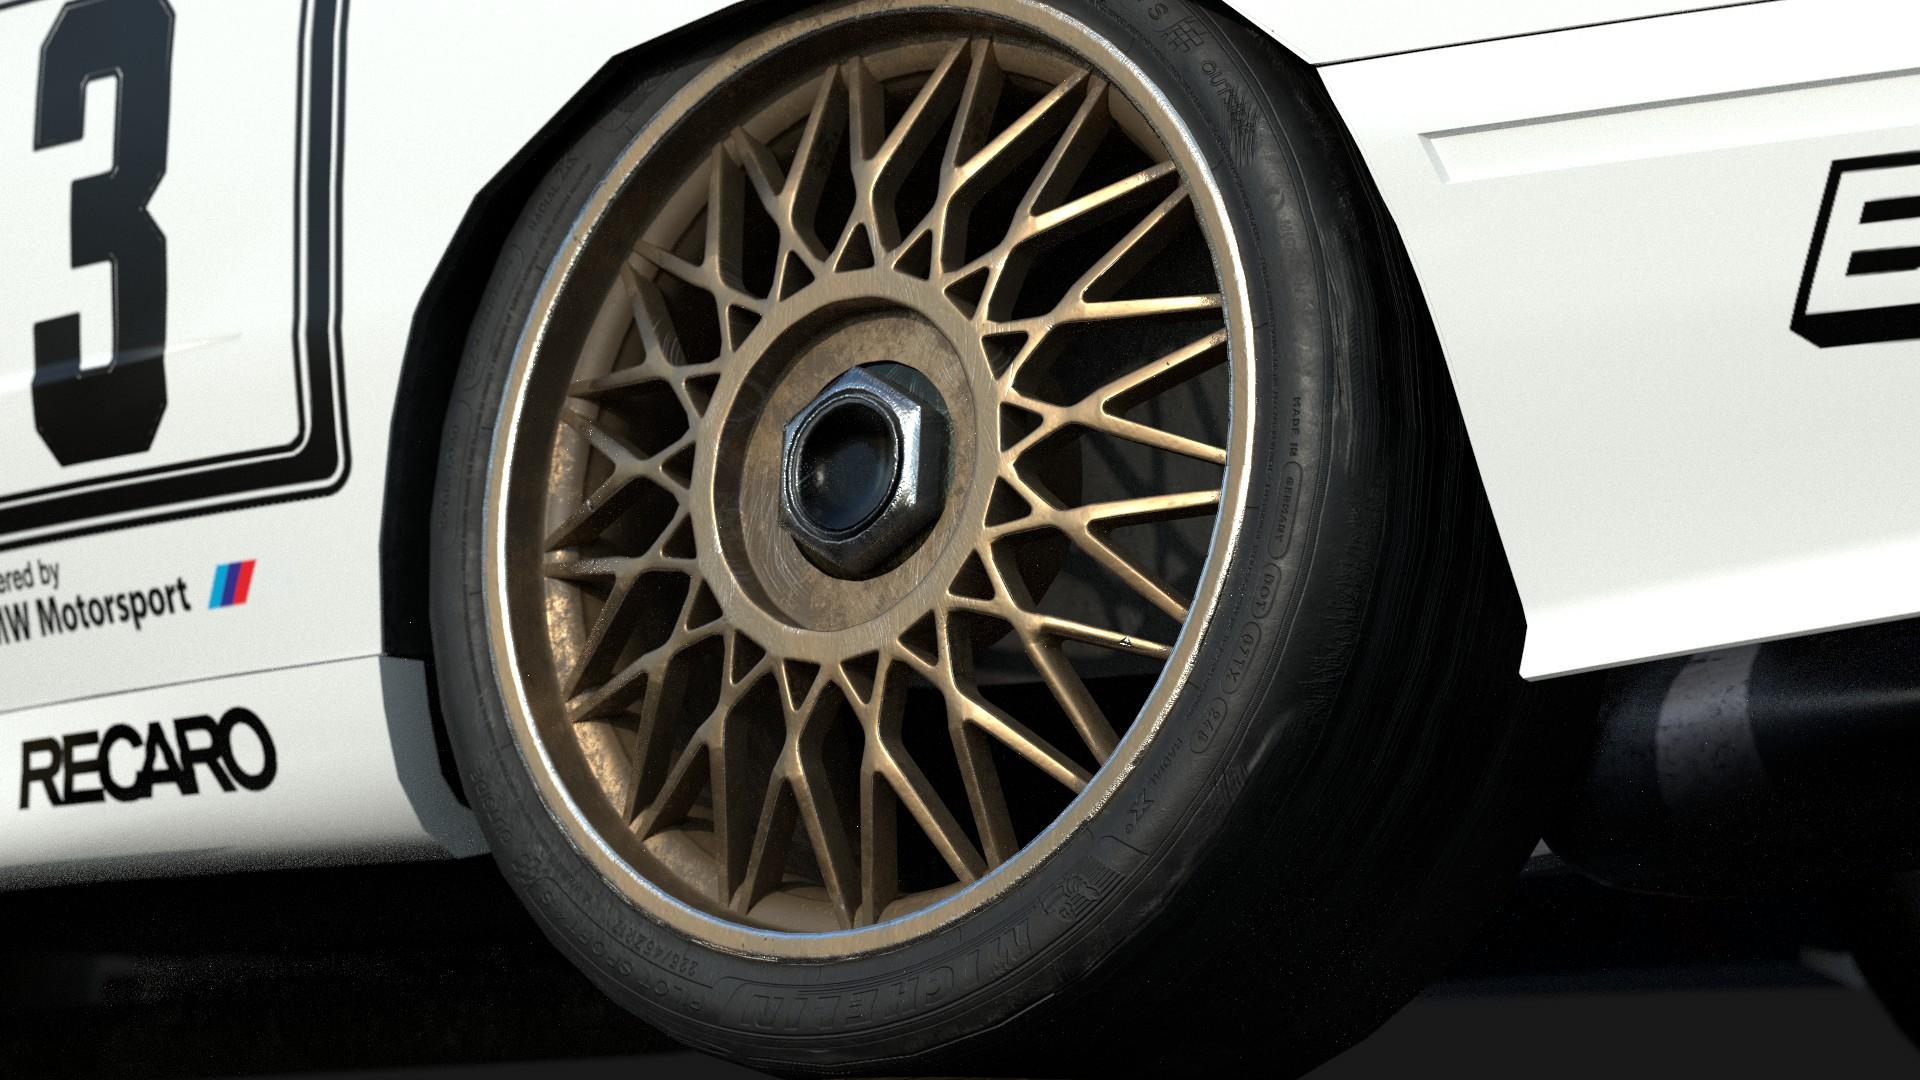 Car Render Challenge 2020 - Legendary DTM season 1992 - Mercedes-Benz 190E vs BMW M3 E30